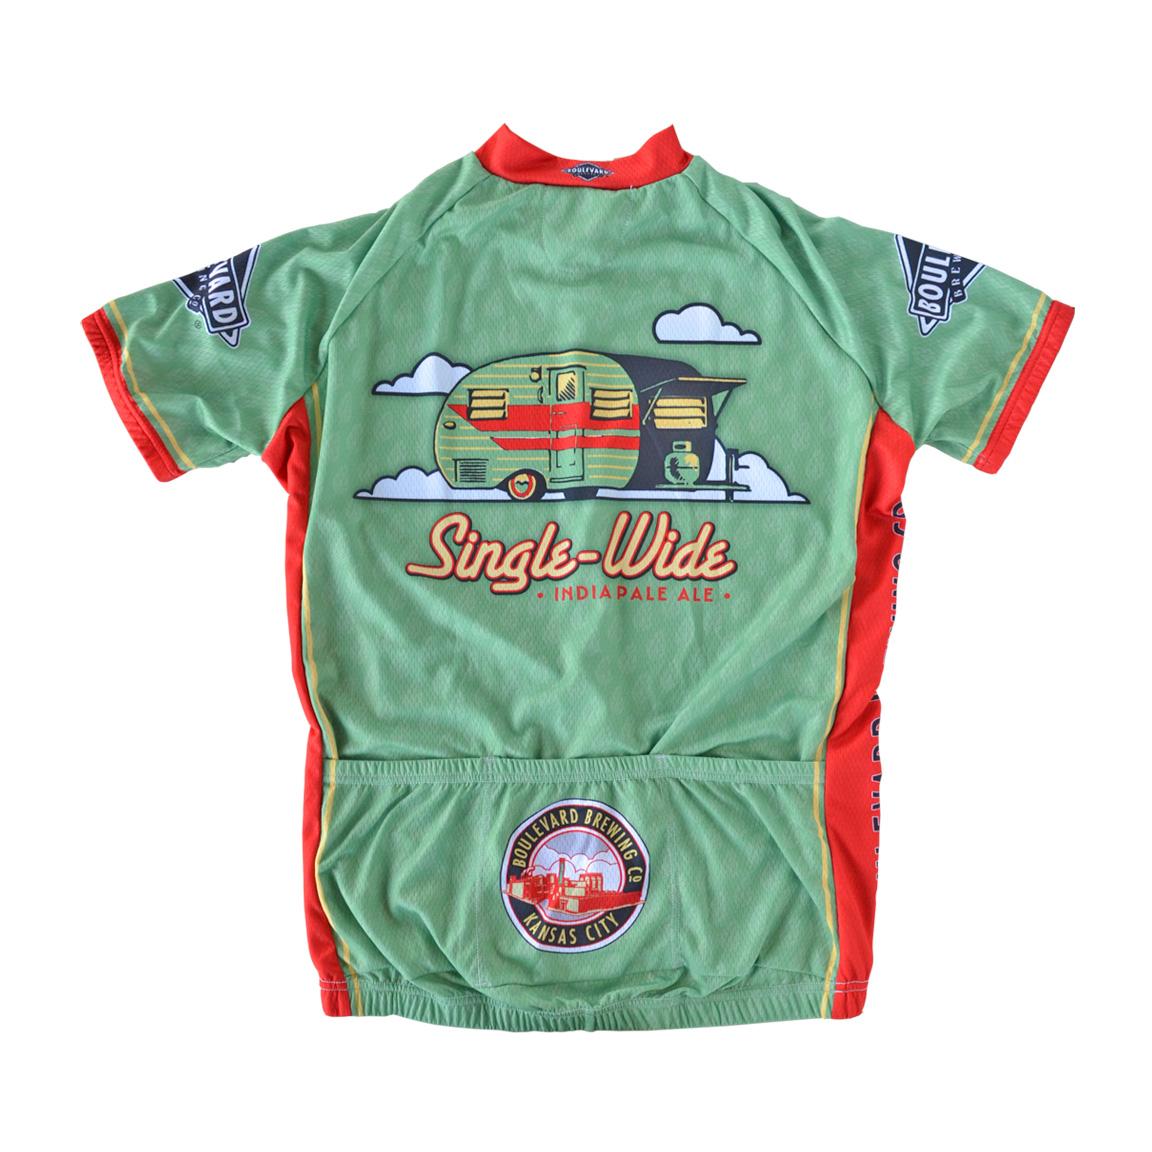 Biking for beer beer bike jerseys for Craft beer cycling jerseys